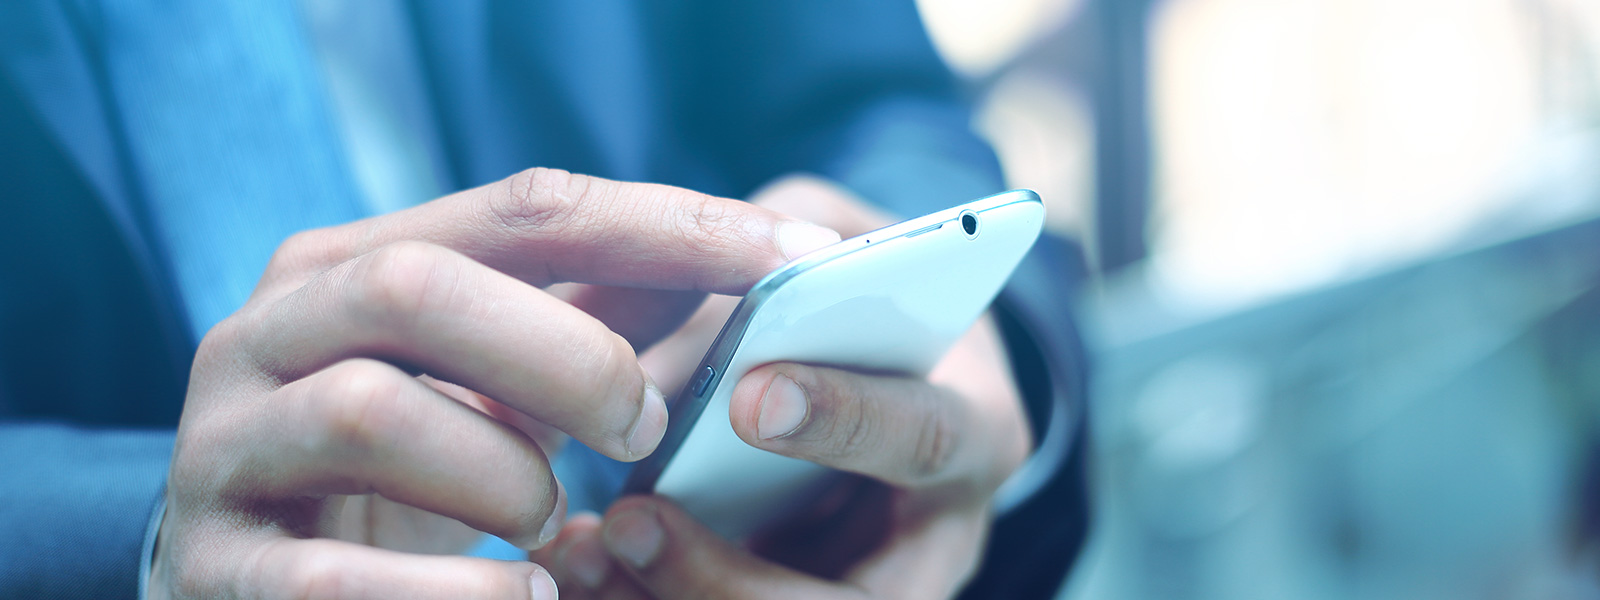 multas-transito-serao-notificadas-sms-email-blog-ceabs